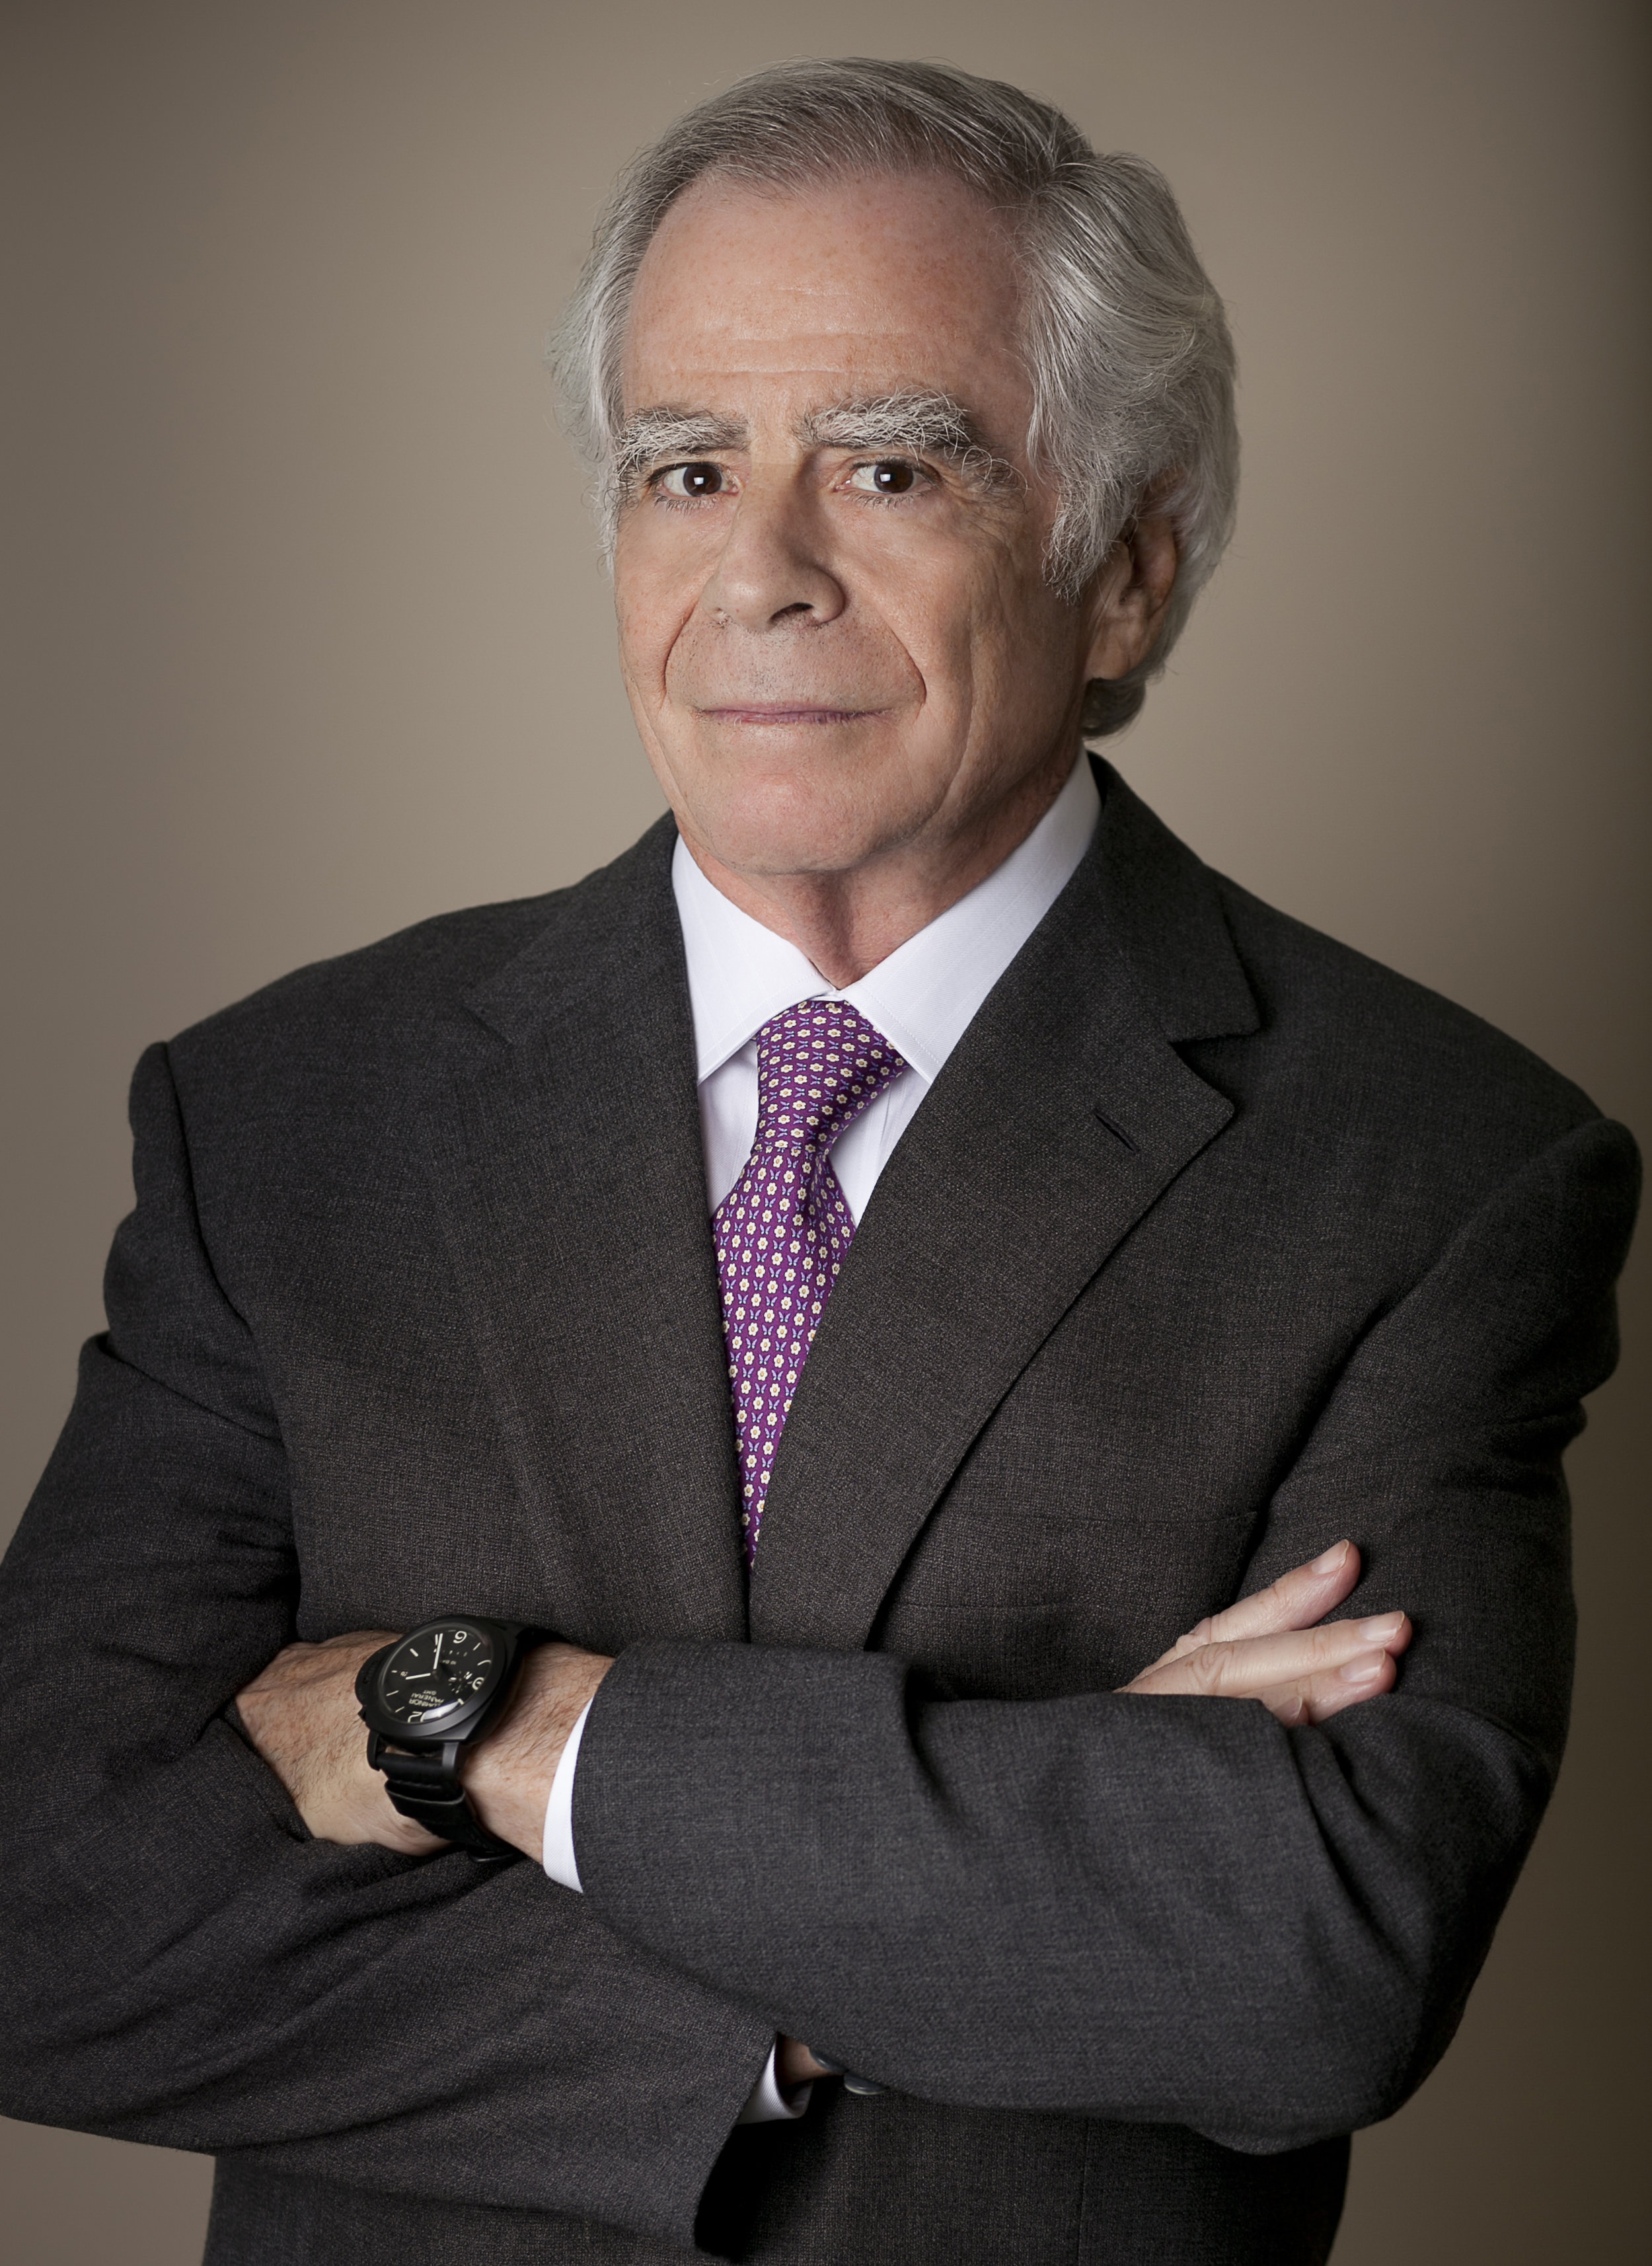 Benjamin R. Jacobs | Founding Partner, JBG Companies